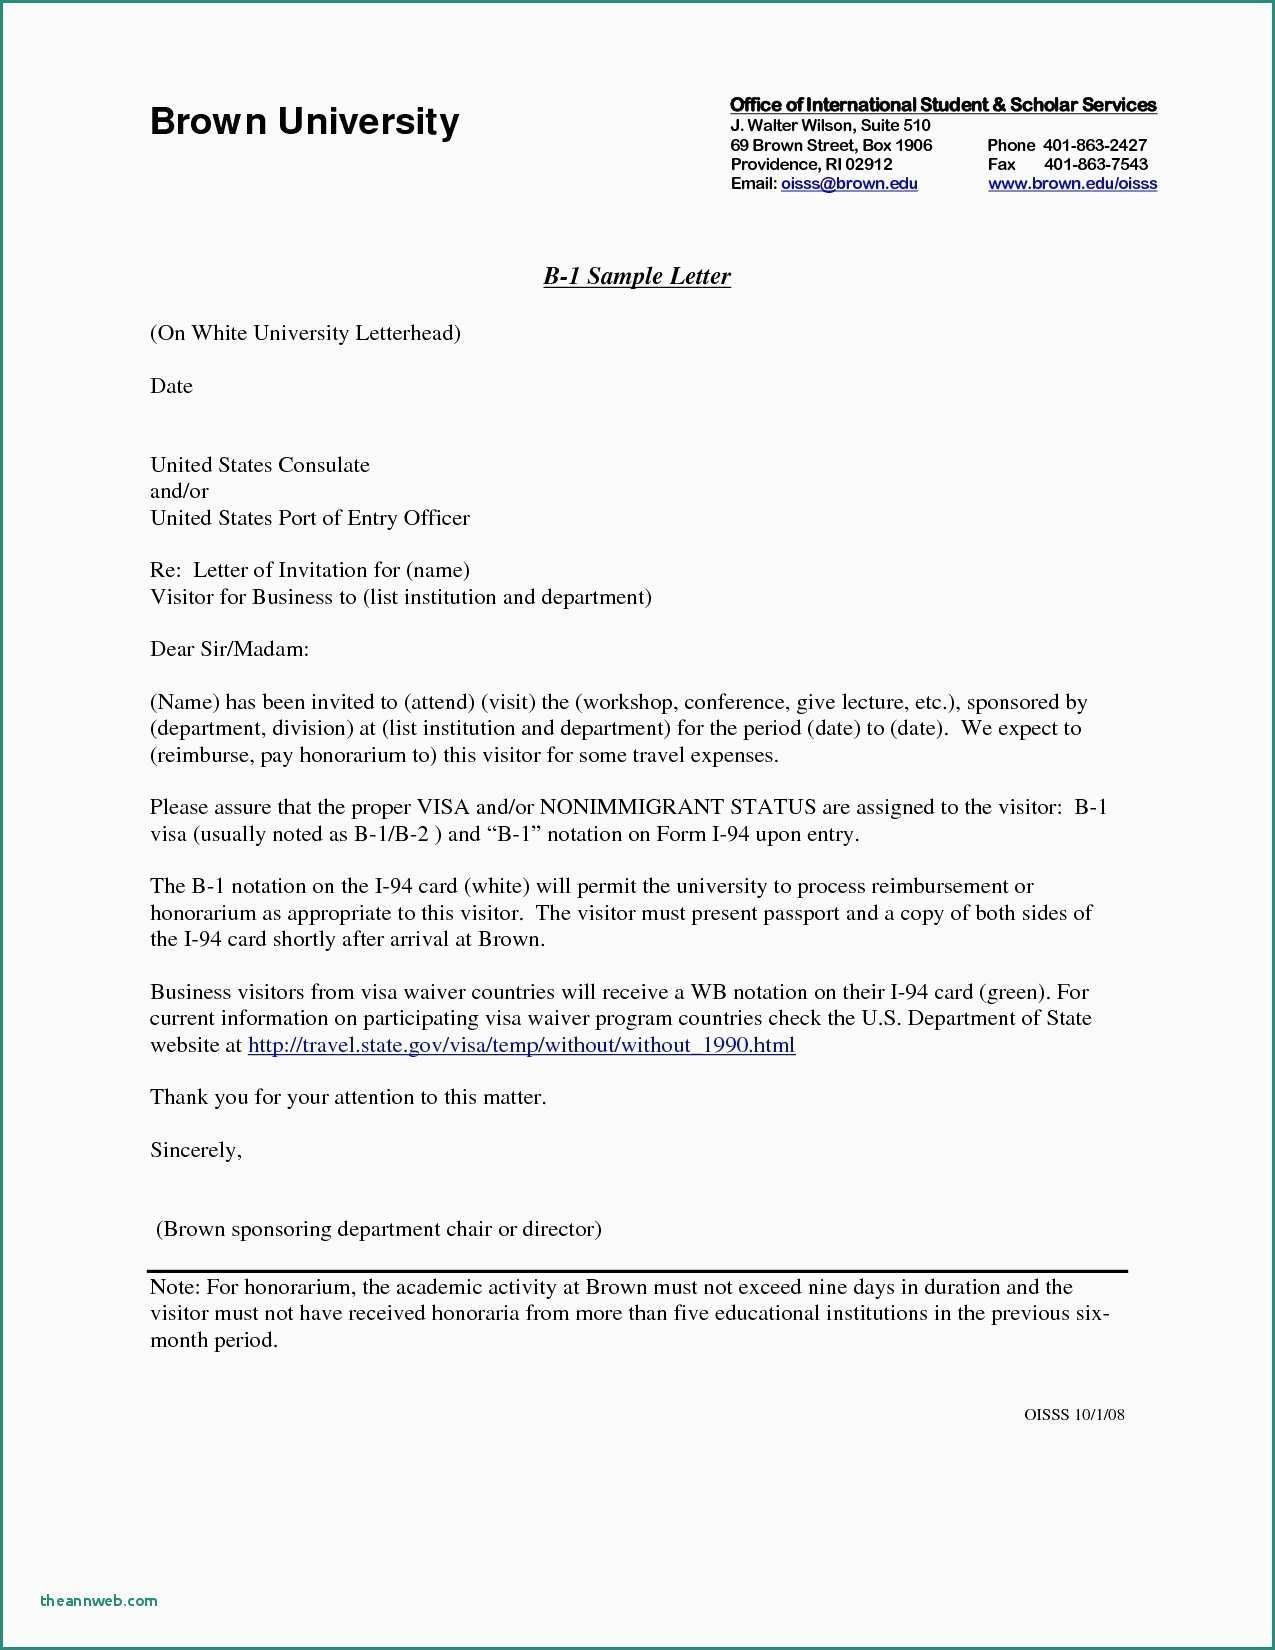 b0dd12db3cfb61e4bf9a302c16c48d74 Sample Invitation Letter Template For Invite Conference on